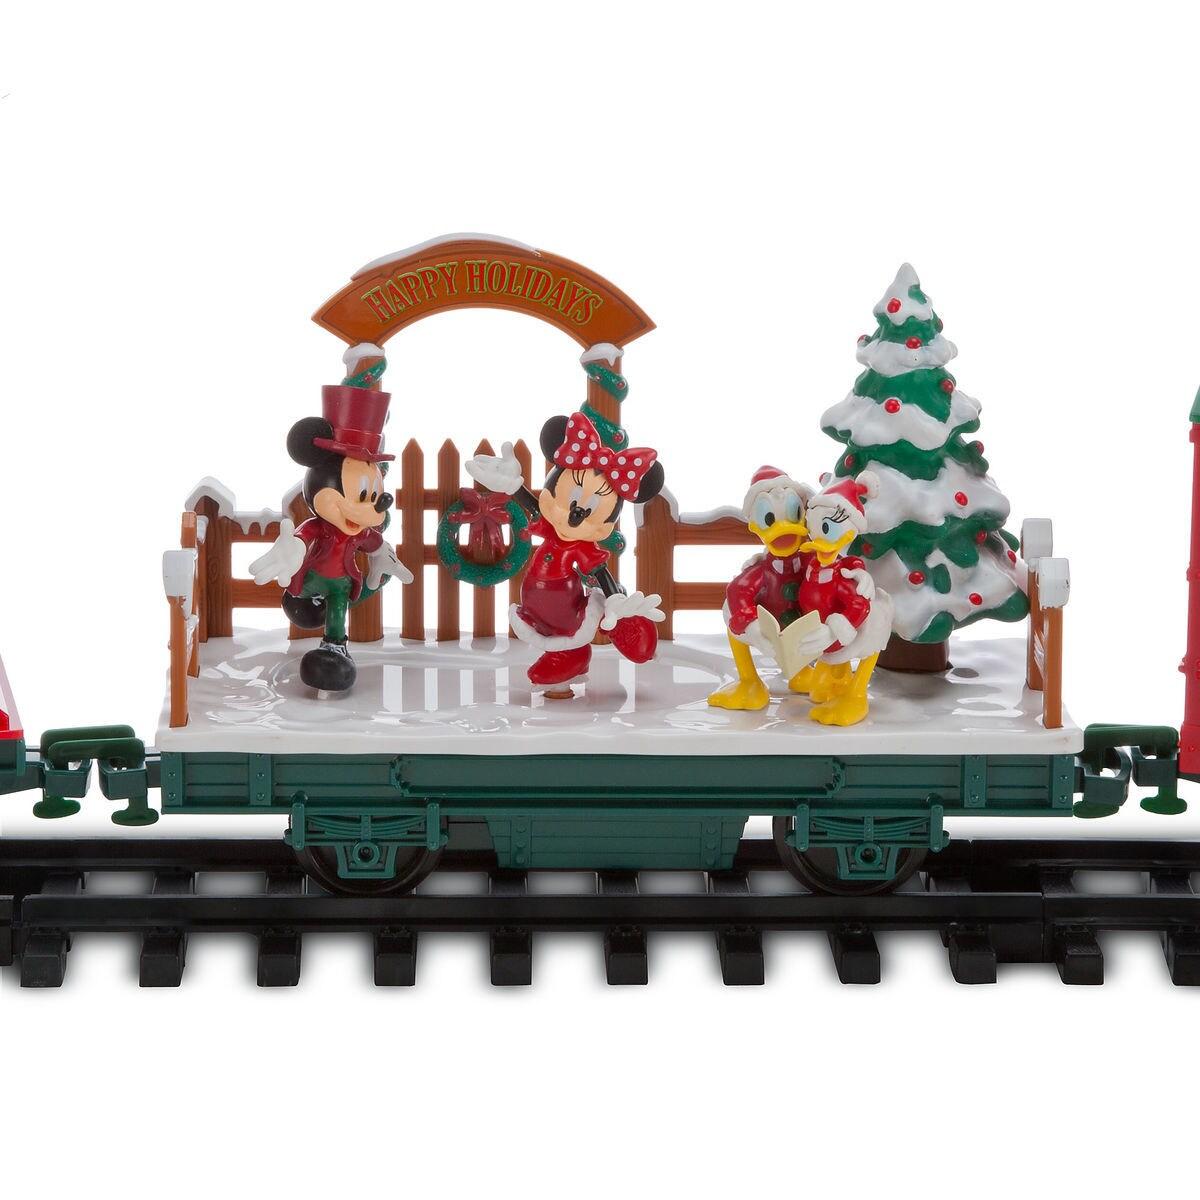 Disney Parks Holiday Train Set | shopDisney